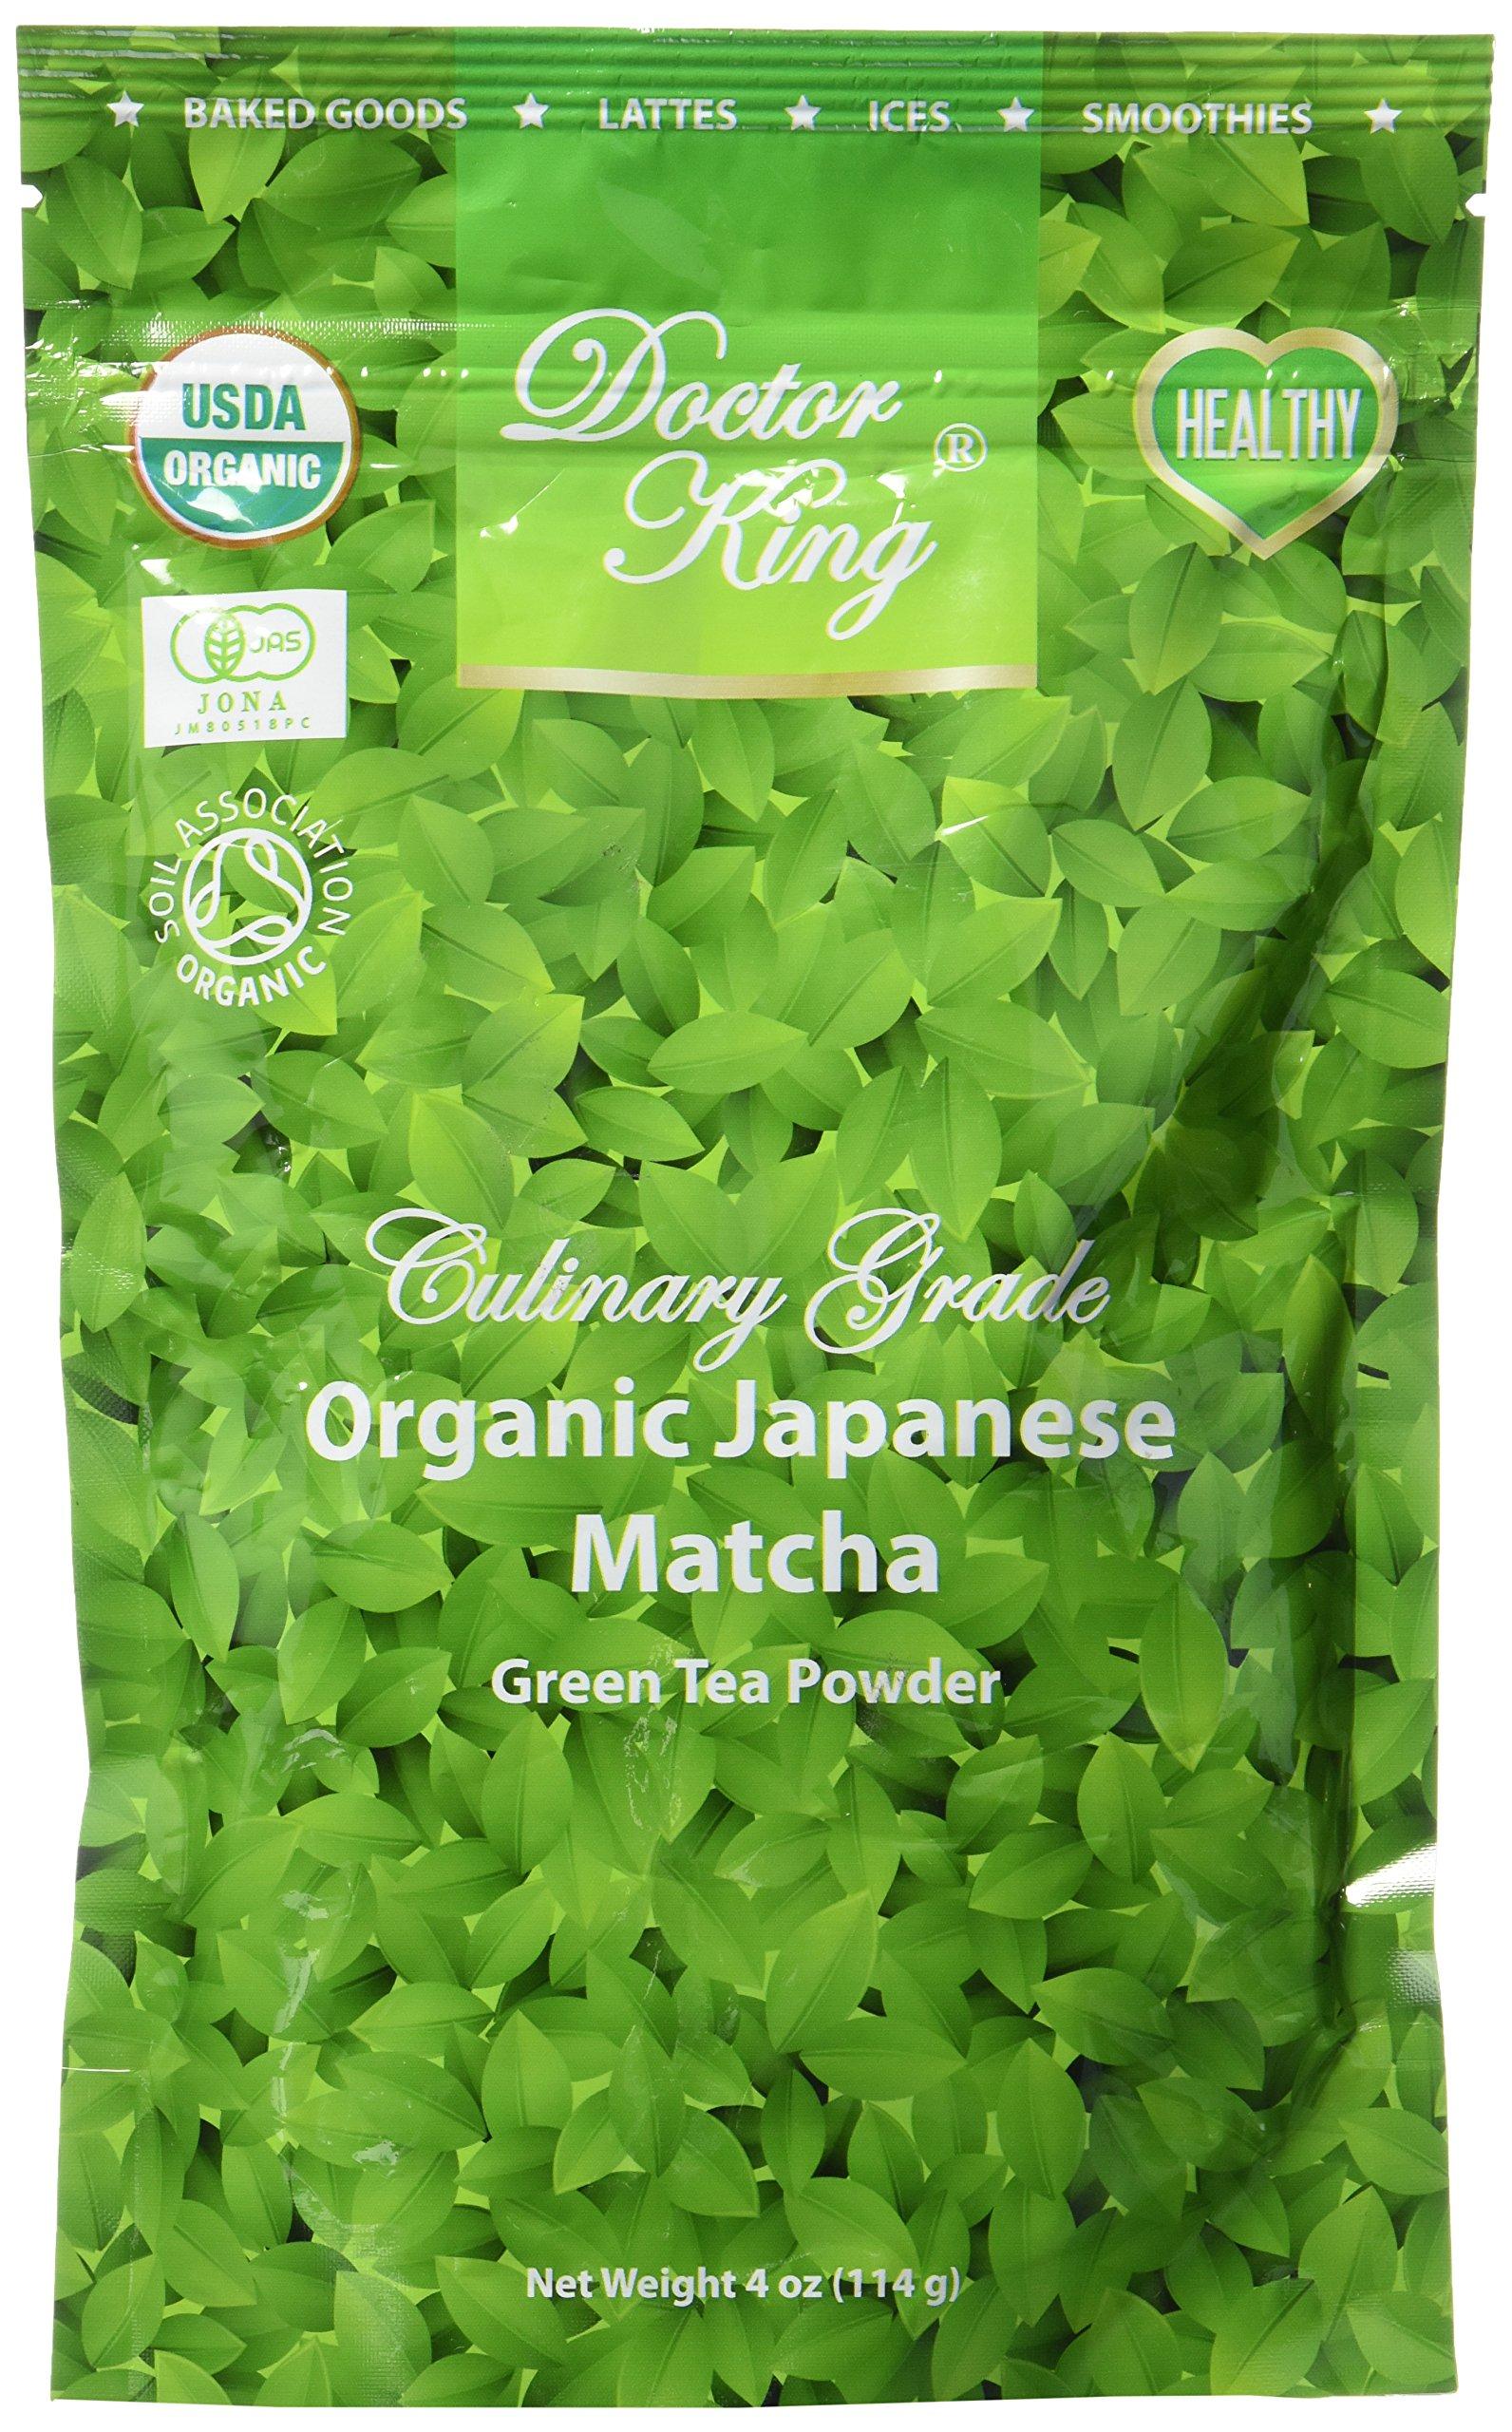 DOCTOR KING Organic Japanese Matcha Green Tea Powder | Culinary Grade | Matcha Lattes, Matcha Smoothies, Baking | Net Weight 4 oz (114 g)